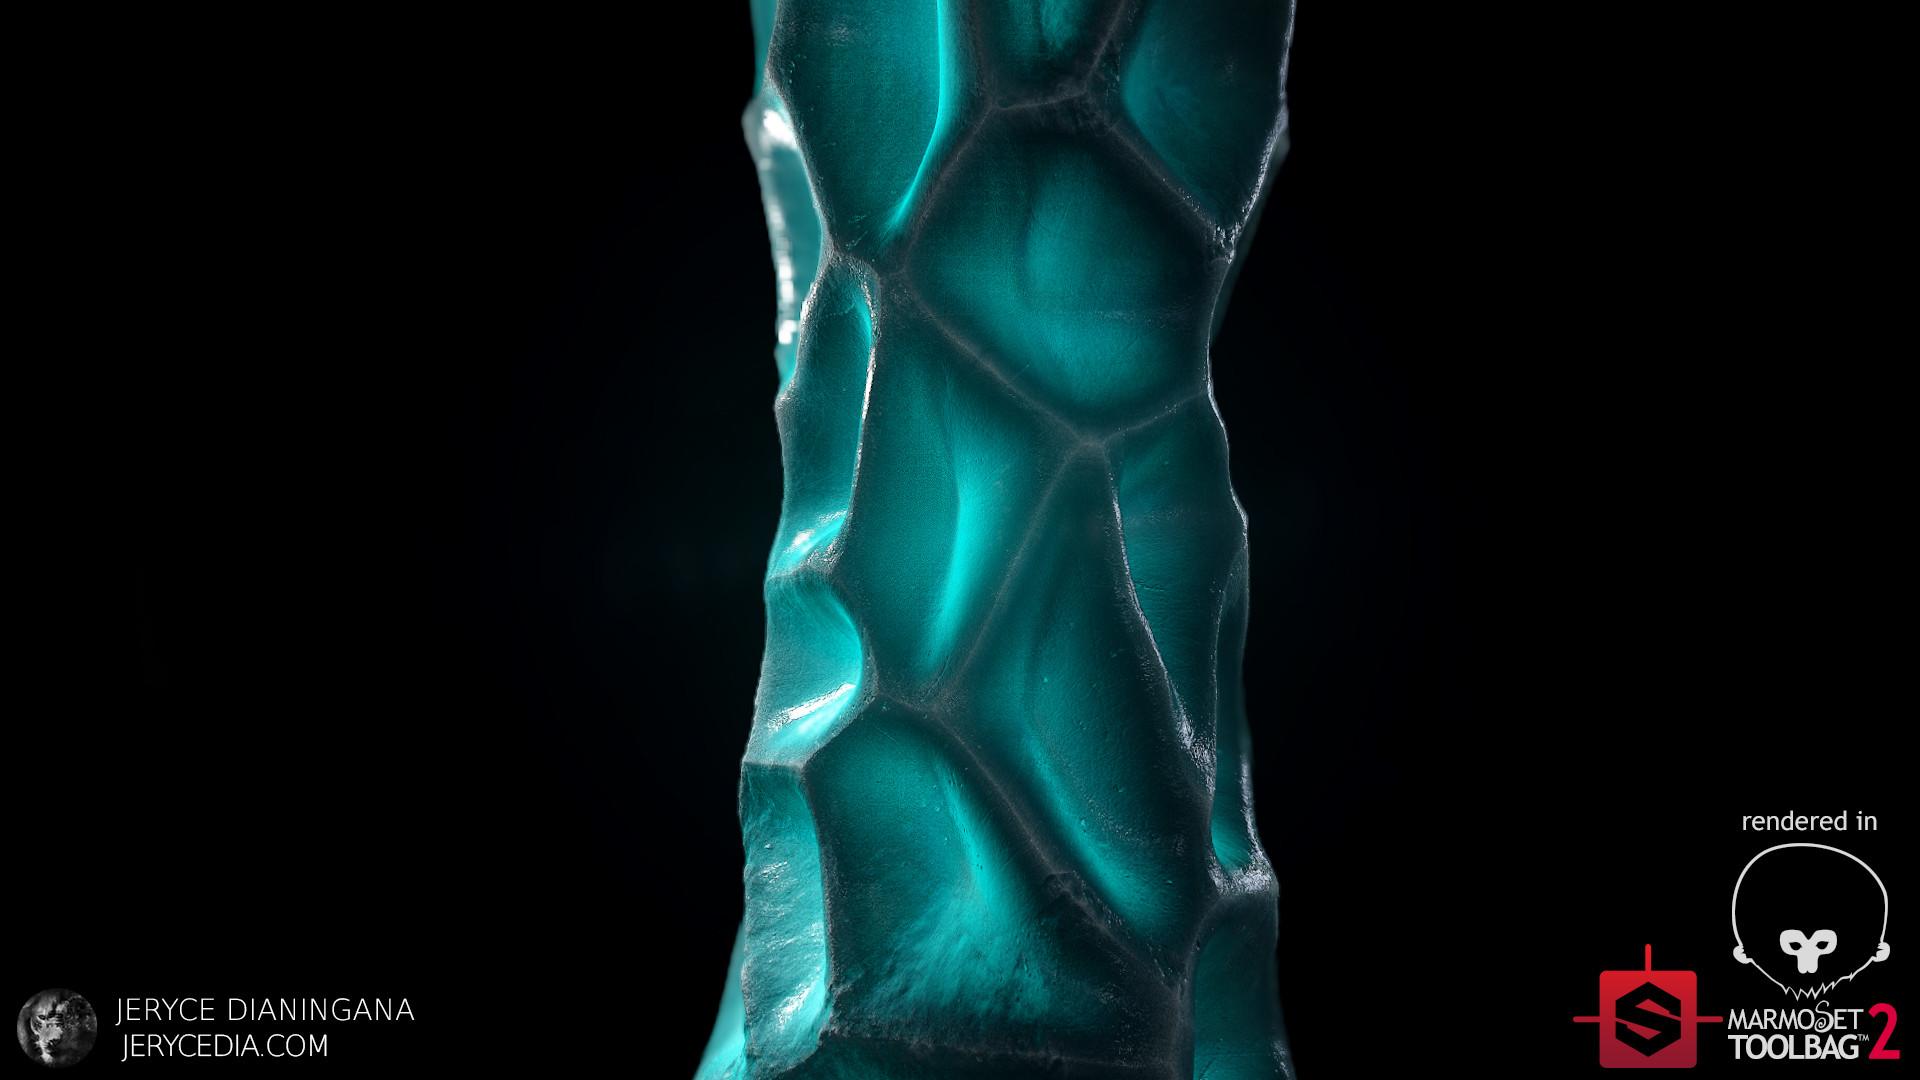 Jeryce dianingana ice 01